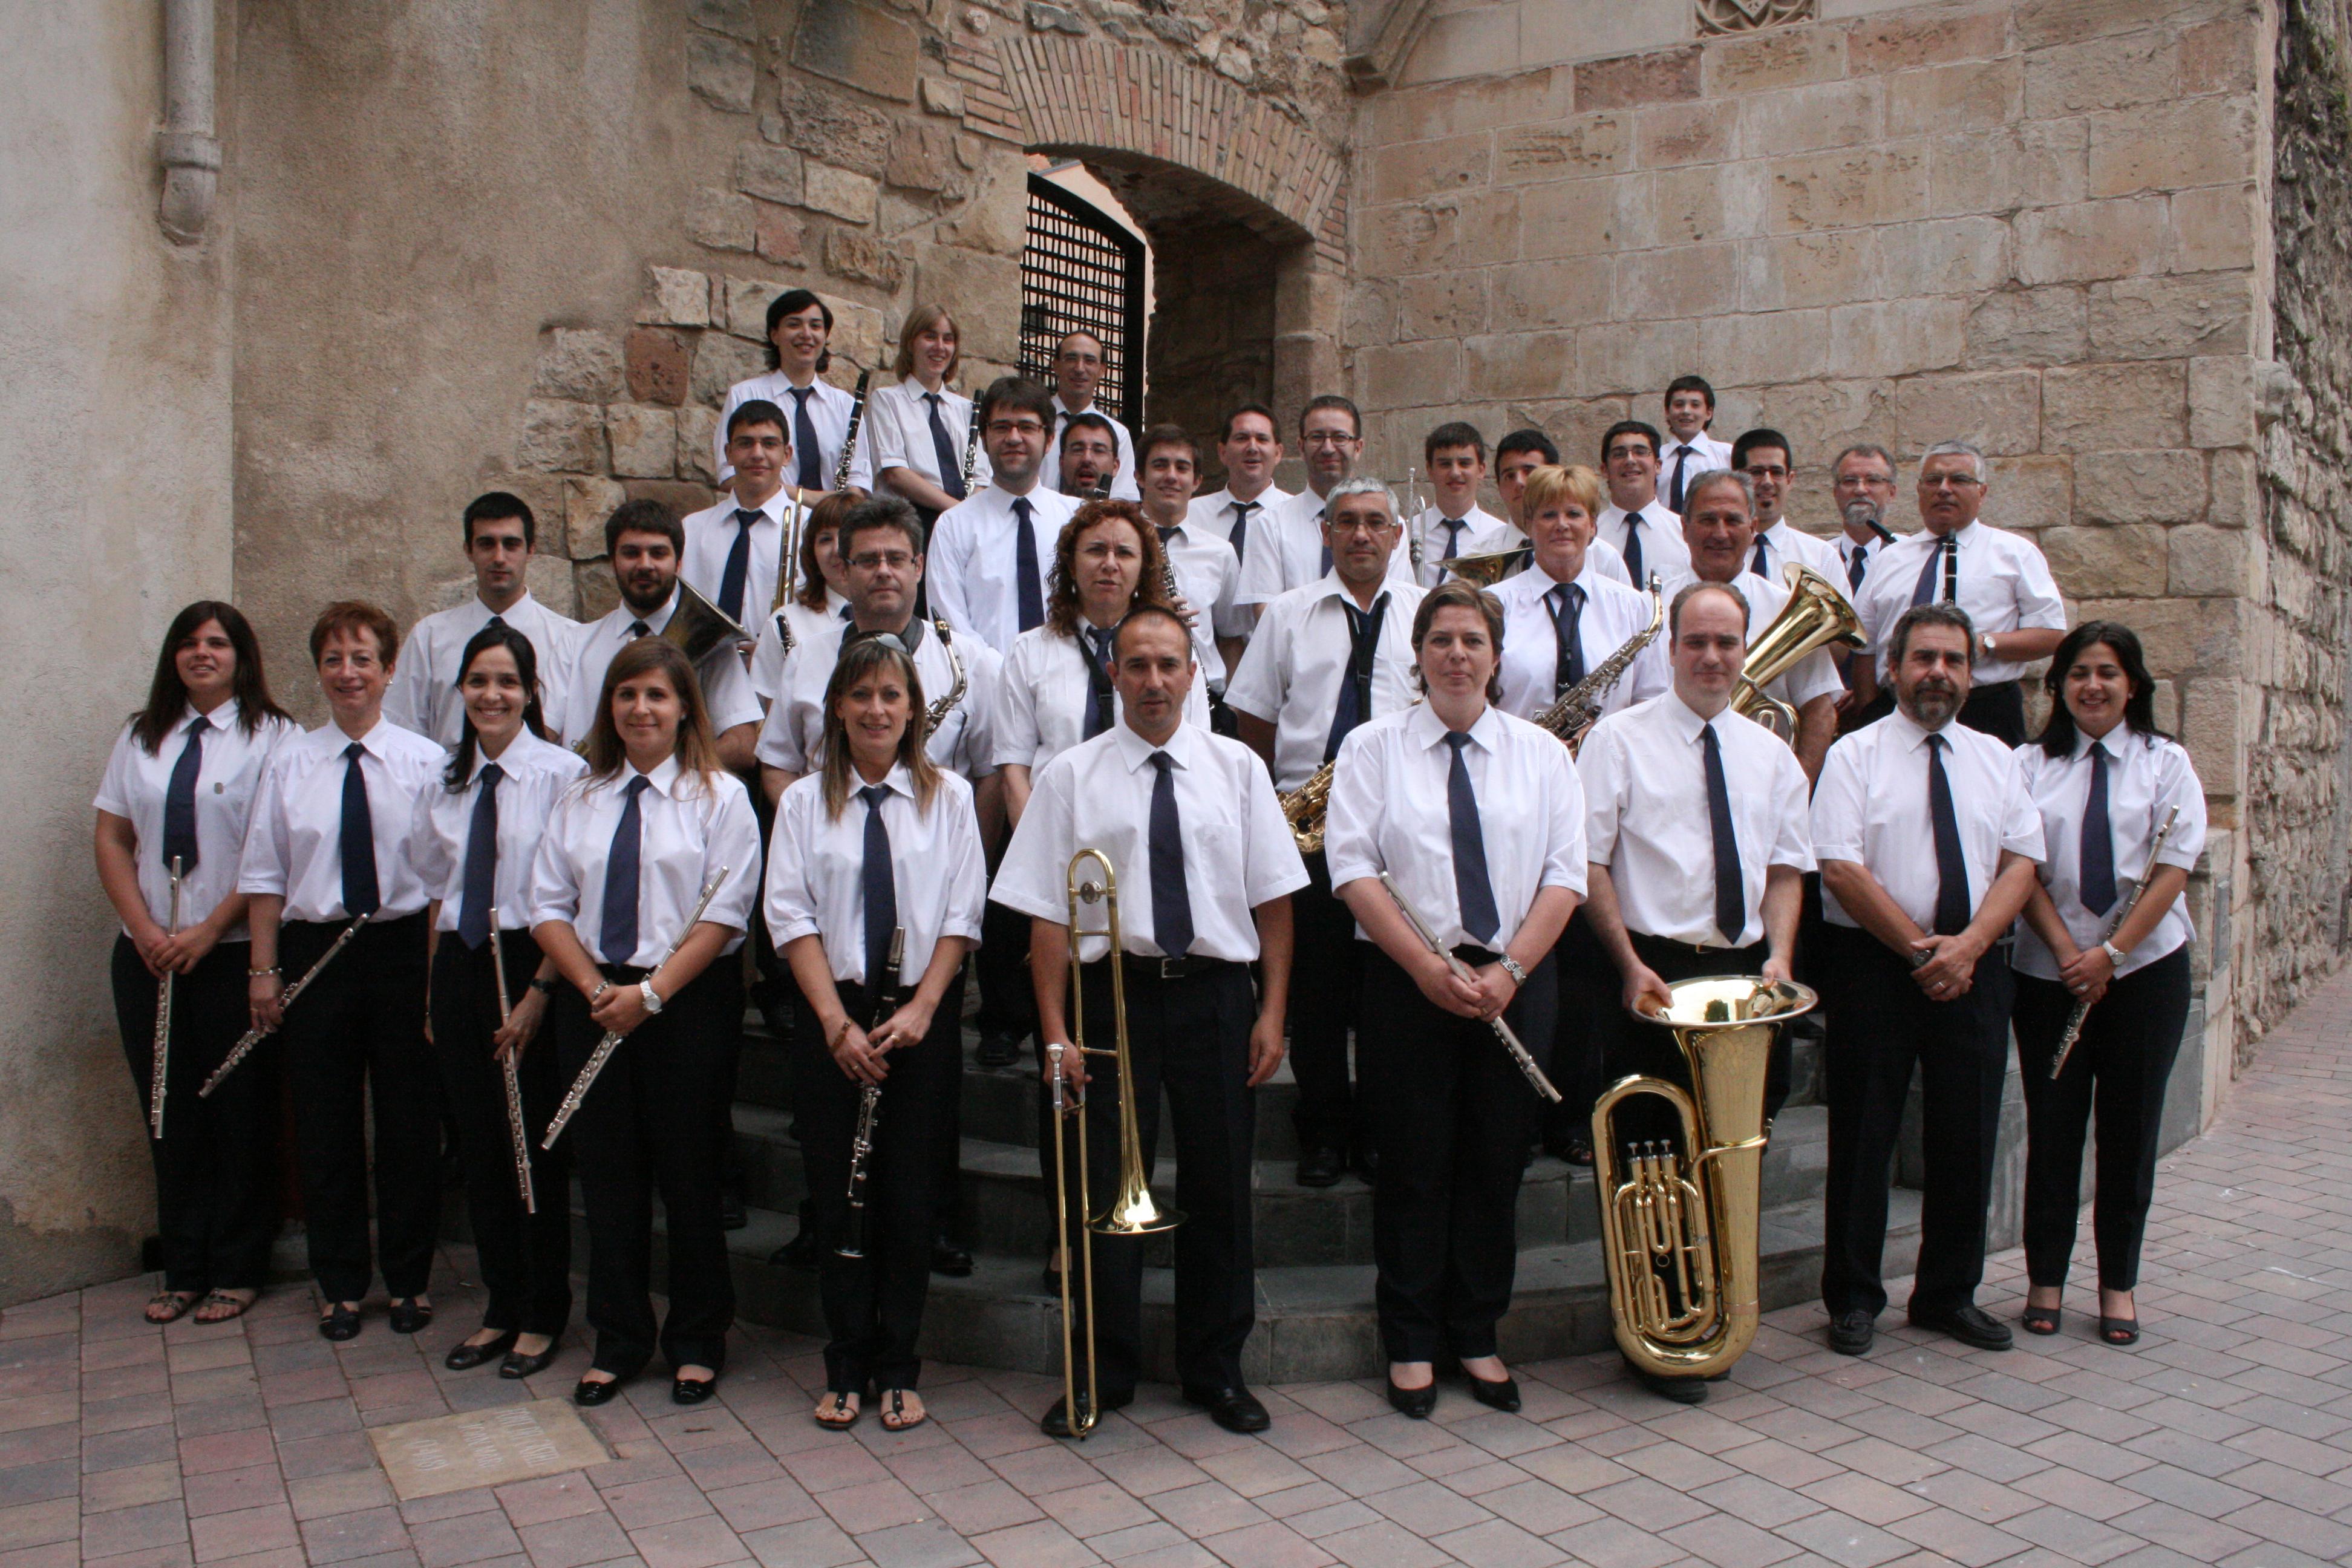 imatge de la banda, estiu 2010